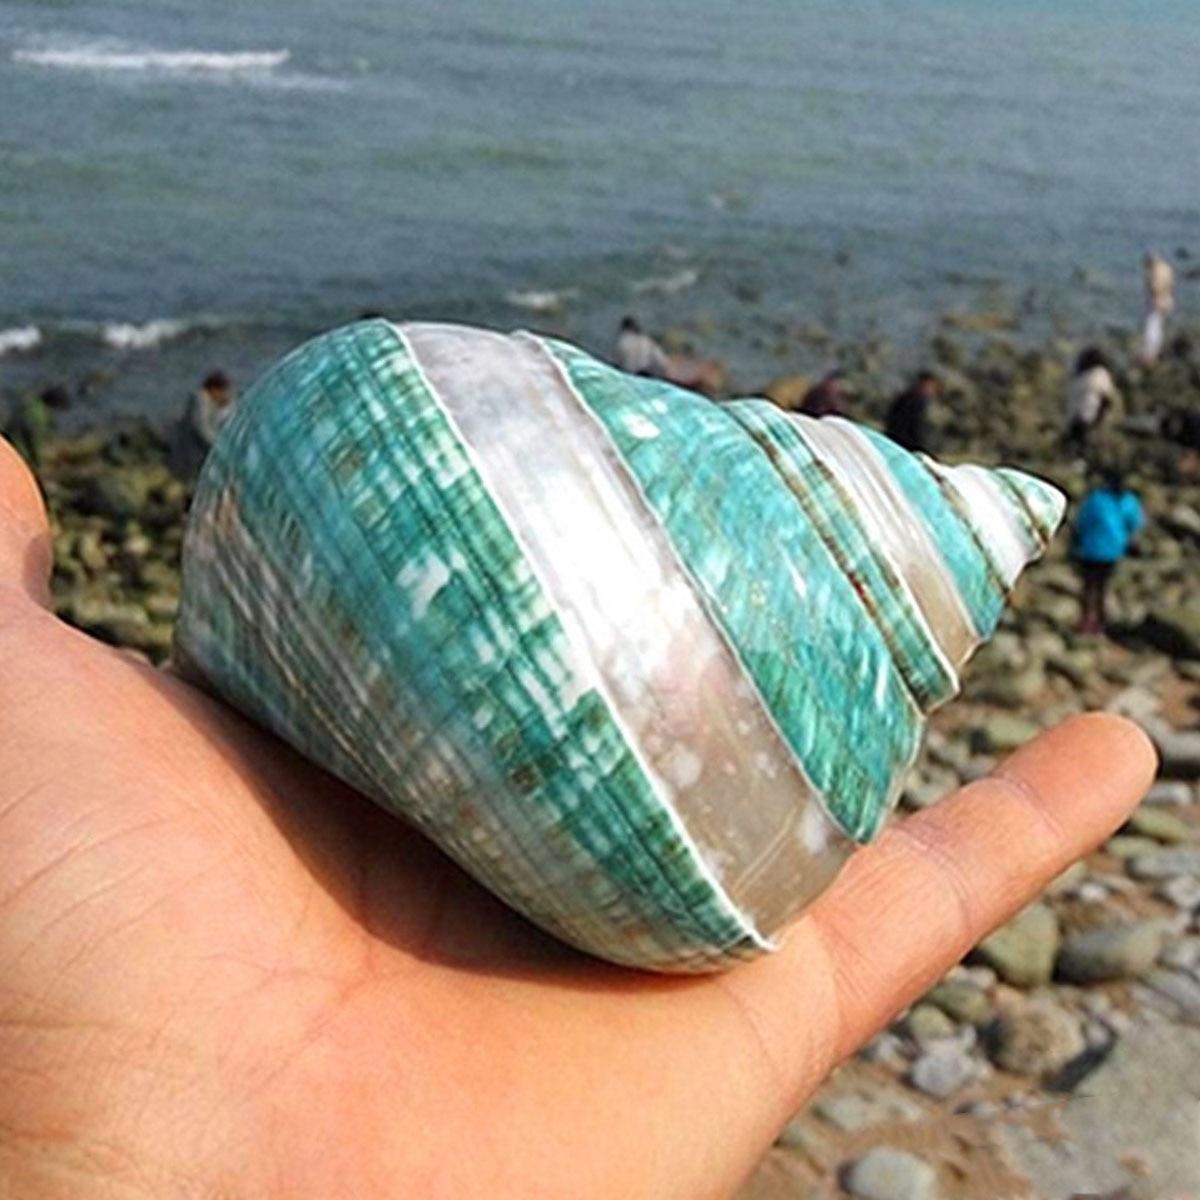 Kiwarm Natural Turban Conch Shell Sea Shell Beach Fish Tank